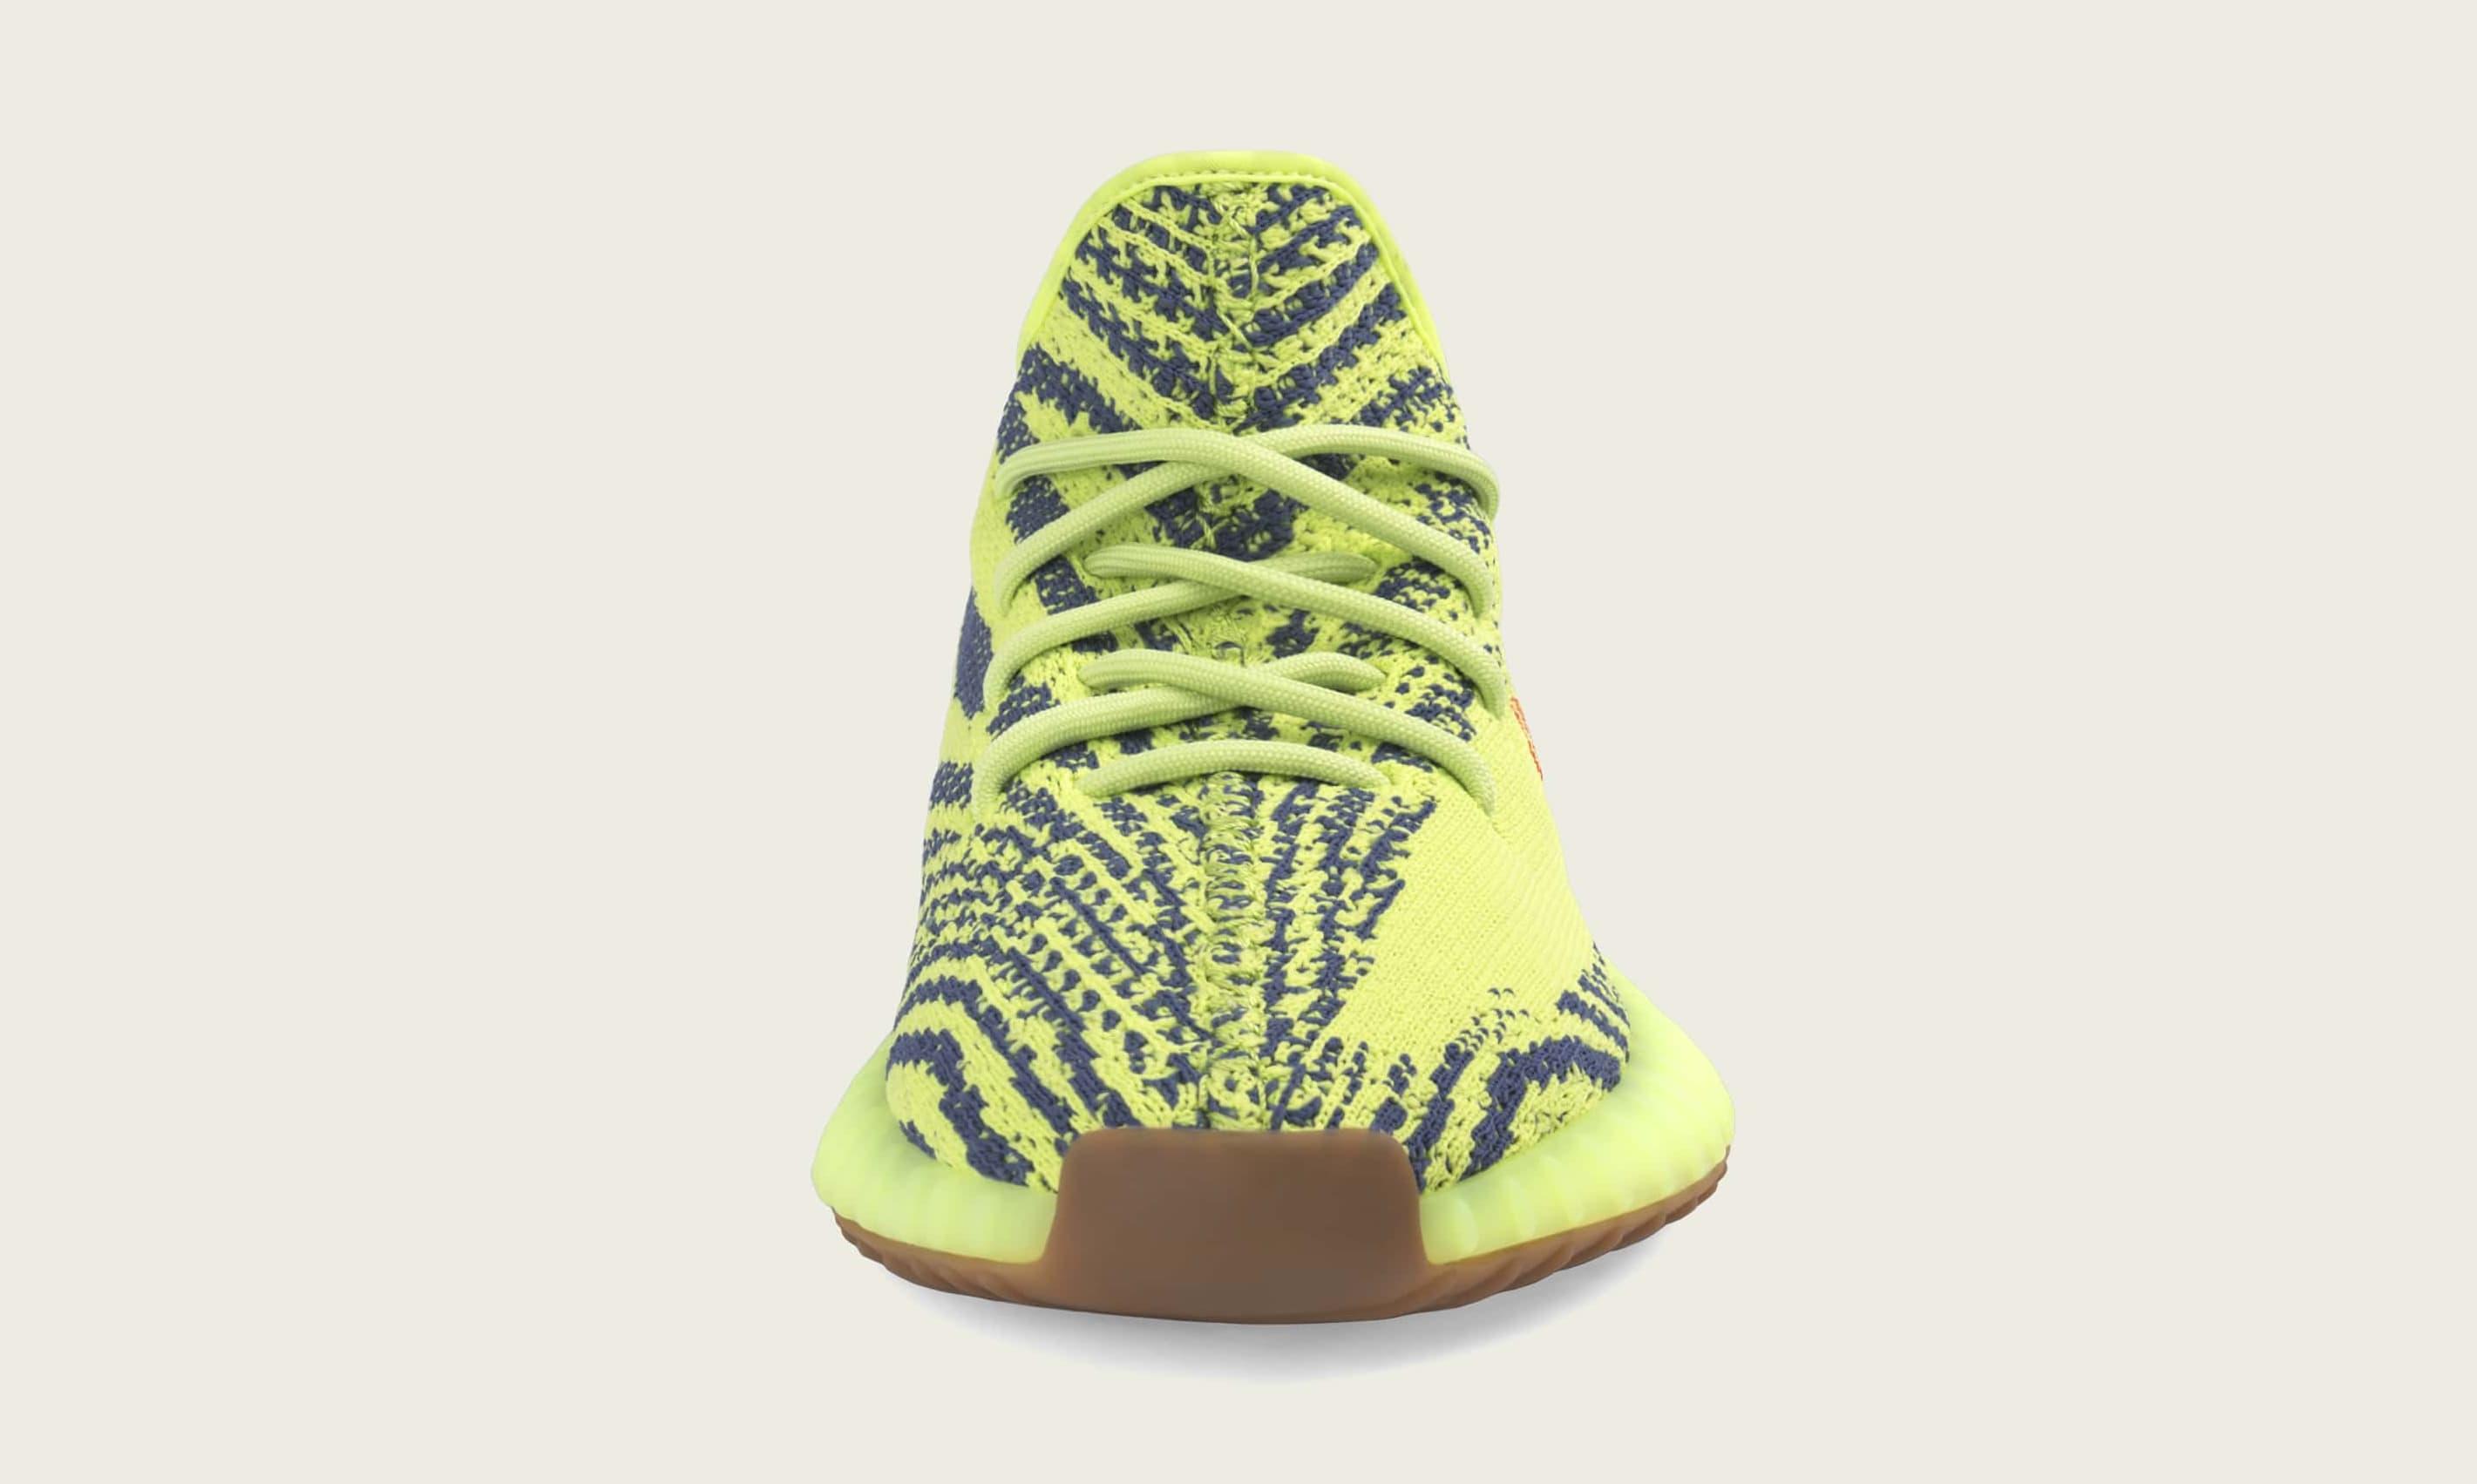 Adidas Yeezy Boost 350 V2 'Semi Frozen Yellow' B37572 (Front)